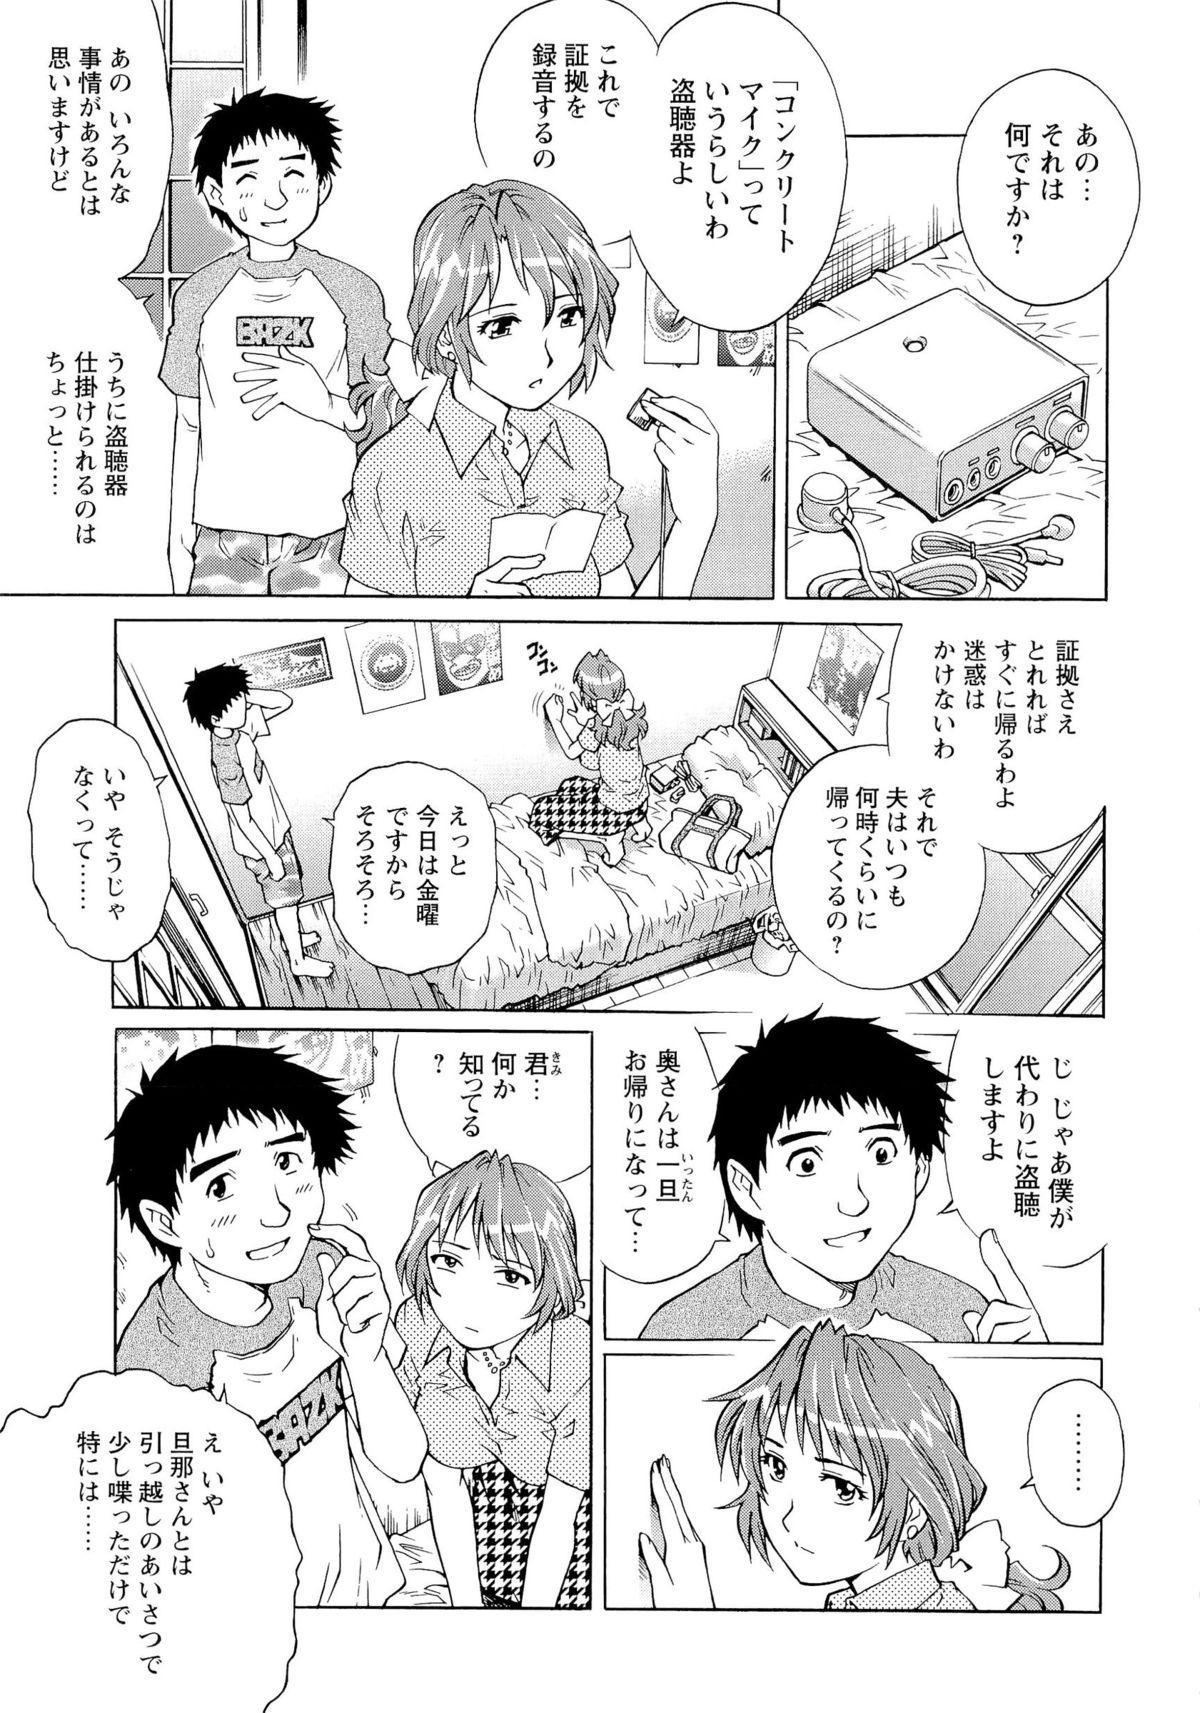 Nureteru Hitozuma - Wetly Wife 149